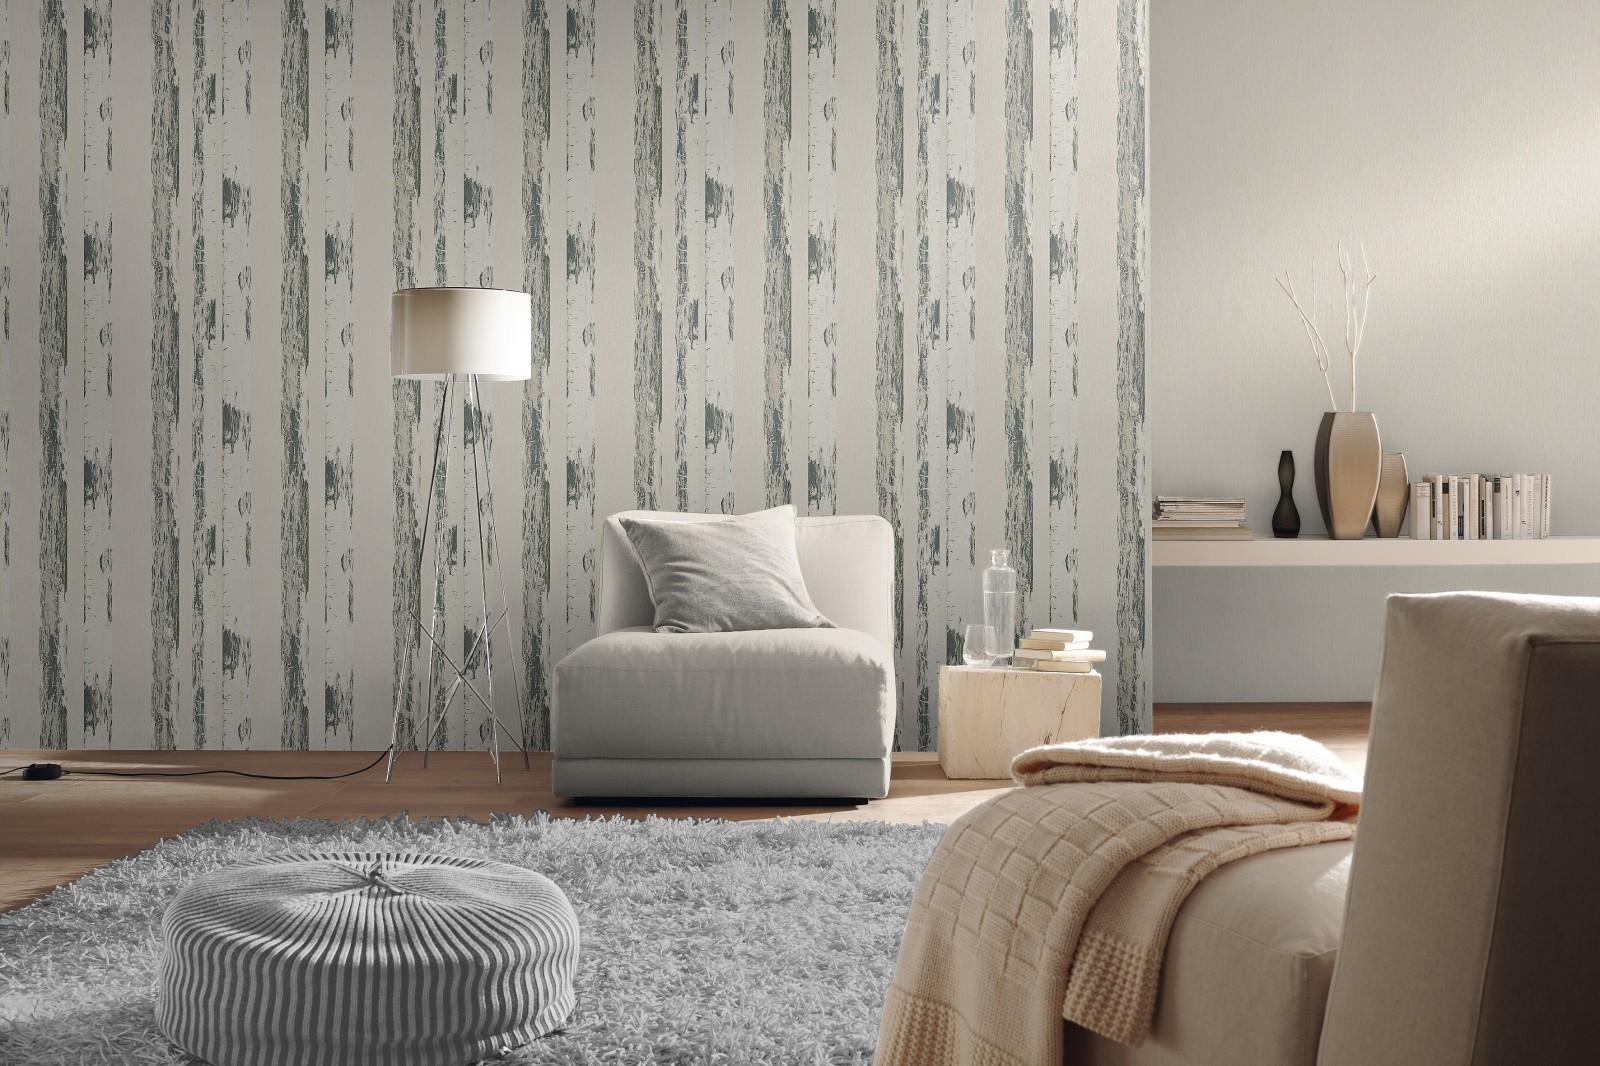 vliestapete creme metallic uni amelie rasch 570700. Black Bedroom Furniture Sets. Home Design Ideas